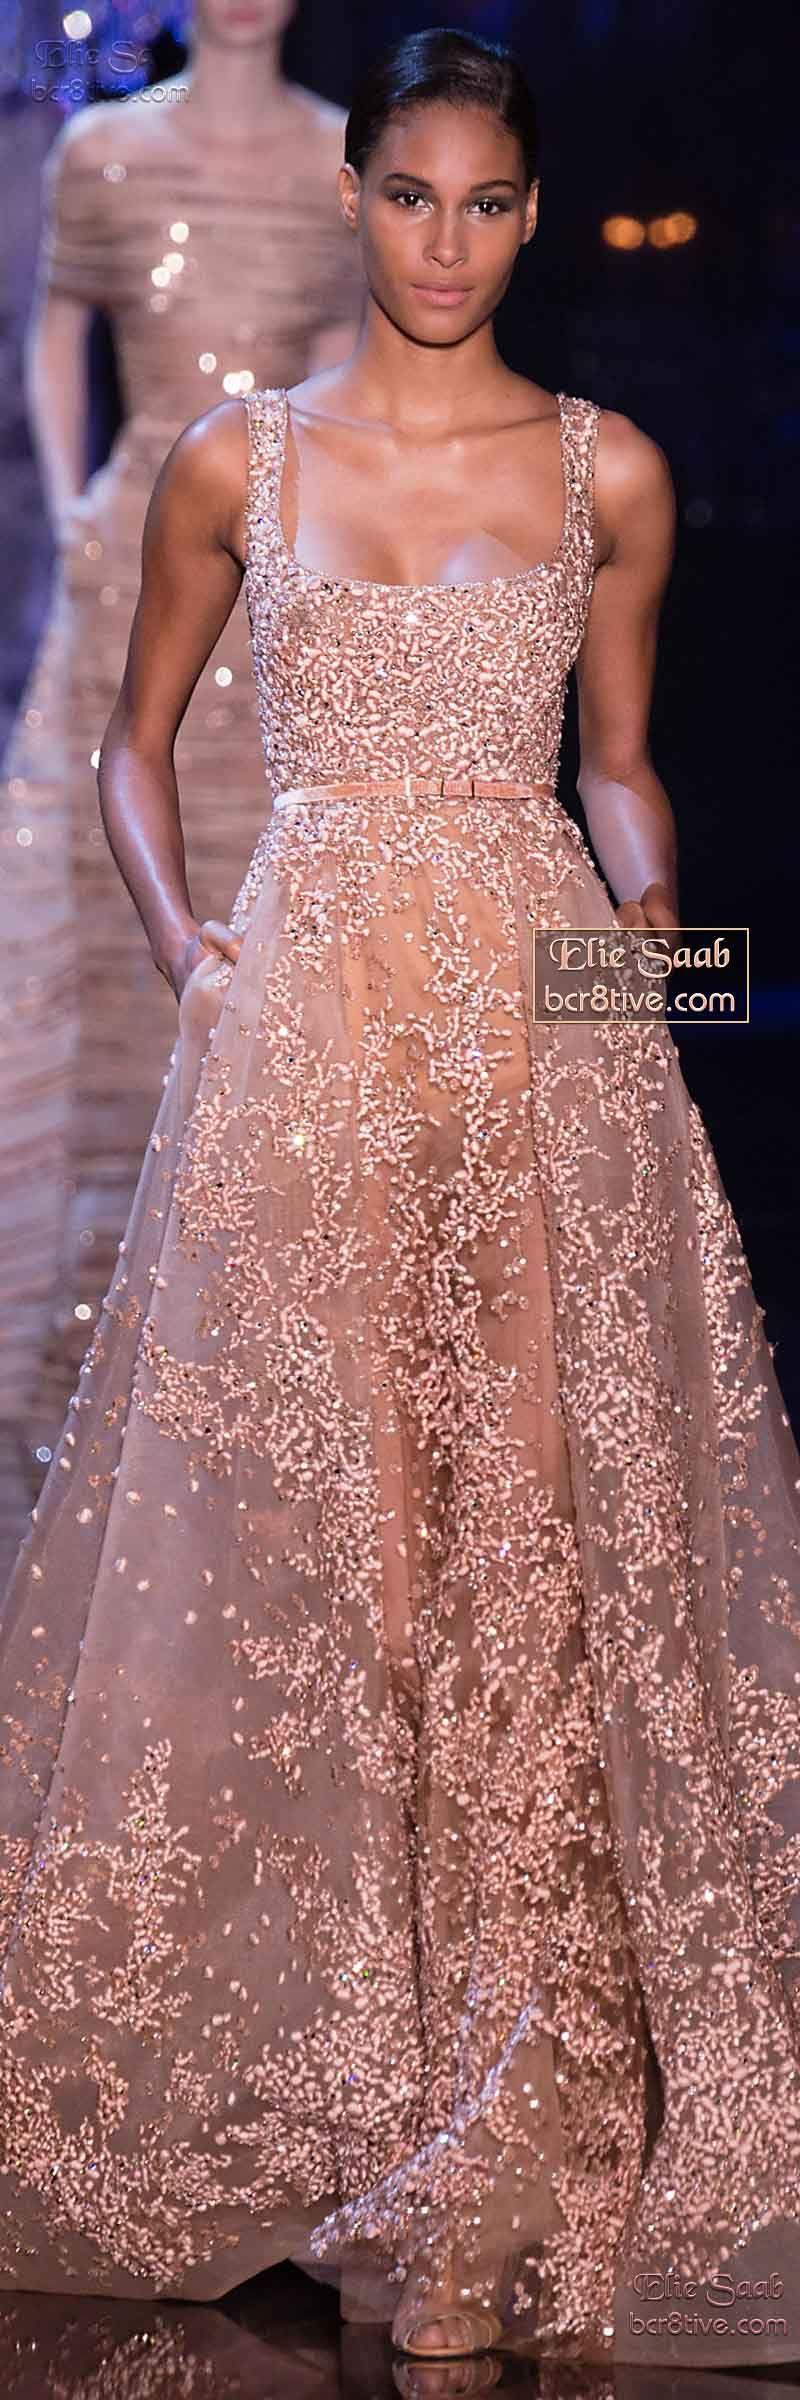 Elie Saab Fall Winter 2014-15 Couture | Ellie saab, Vestiditos y Me ...